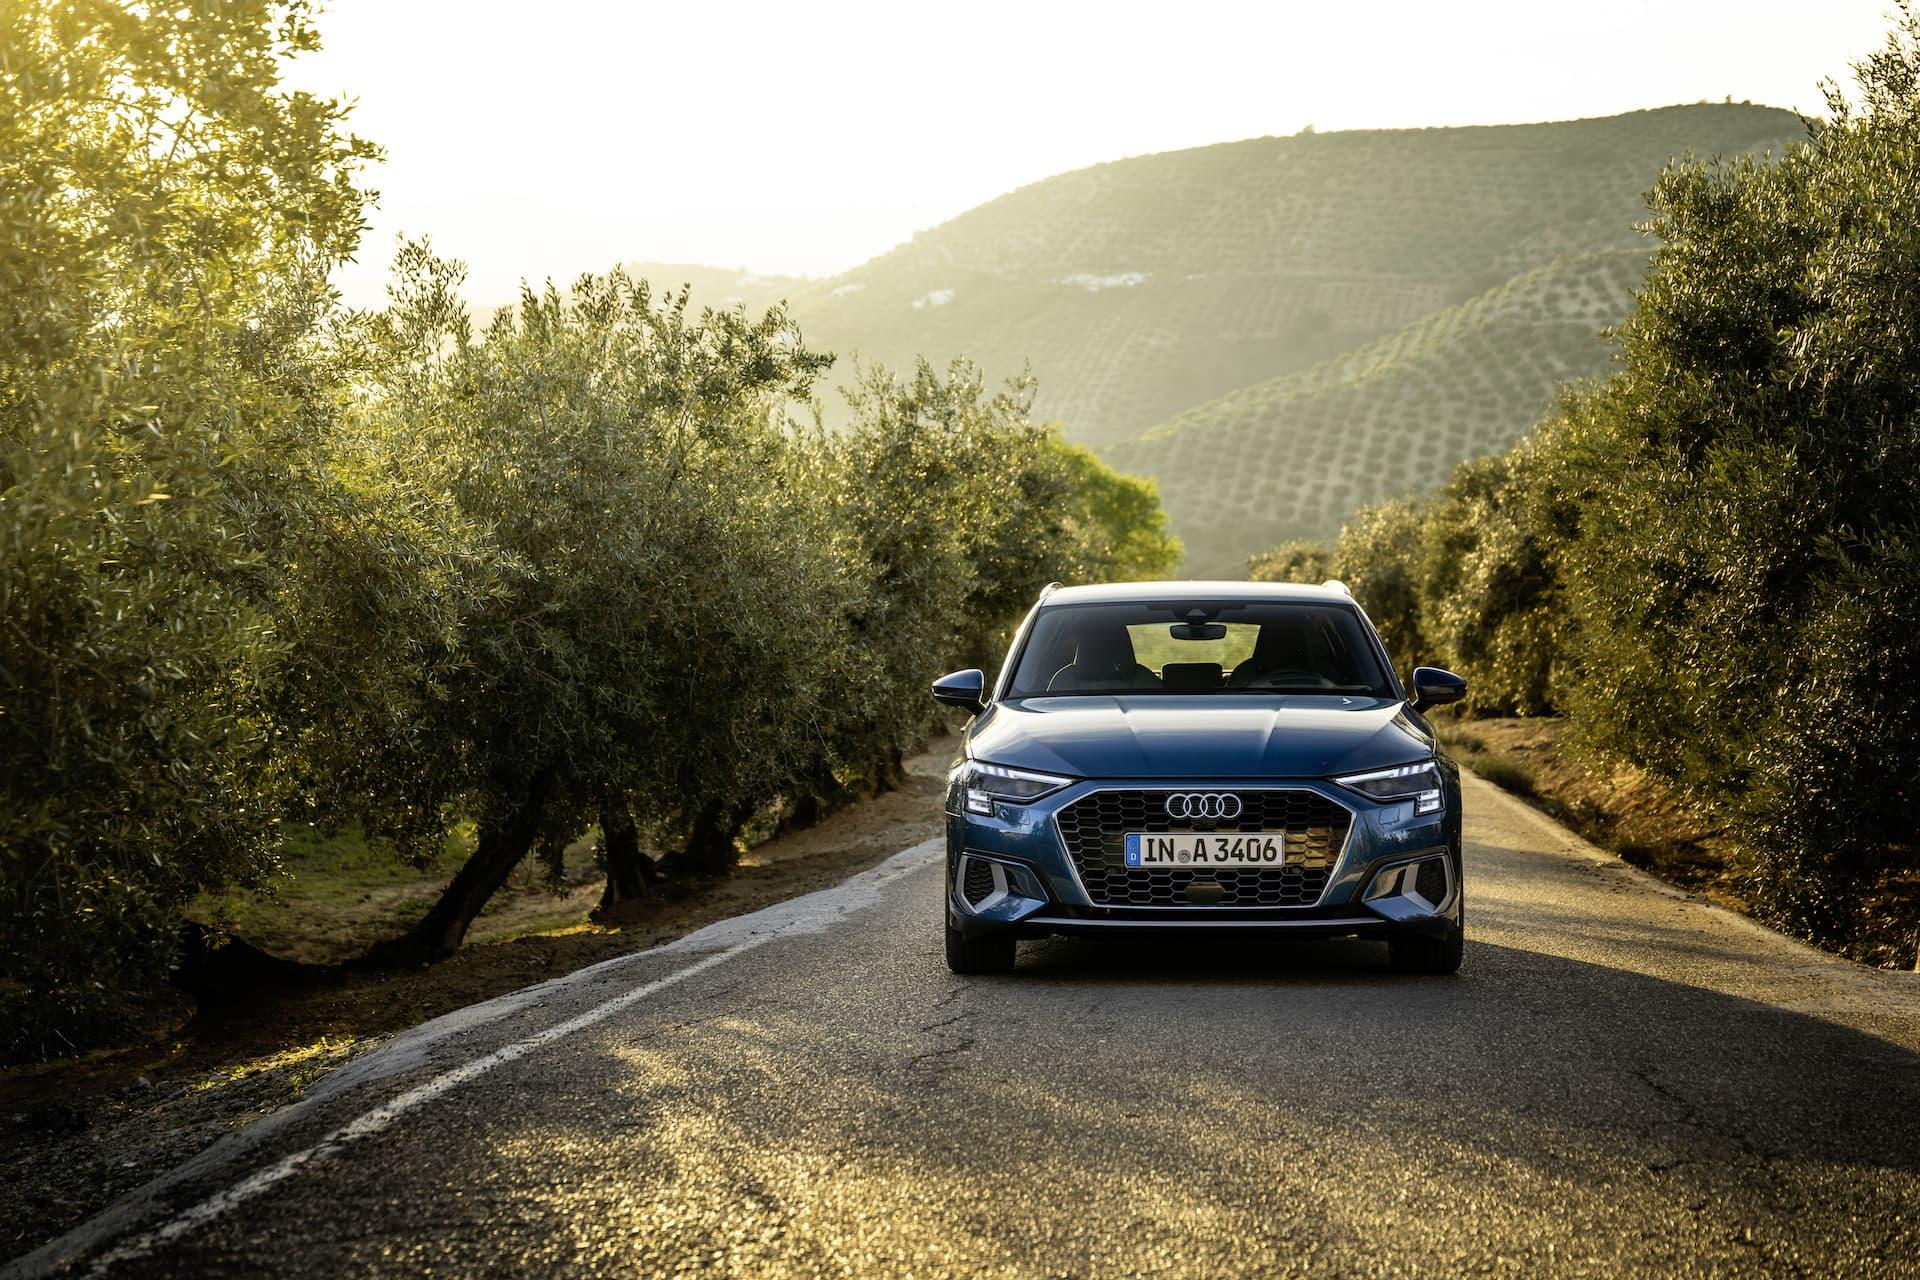 Audi A3 Sportback 2020 Azul Turbo Exterior 4